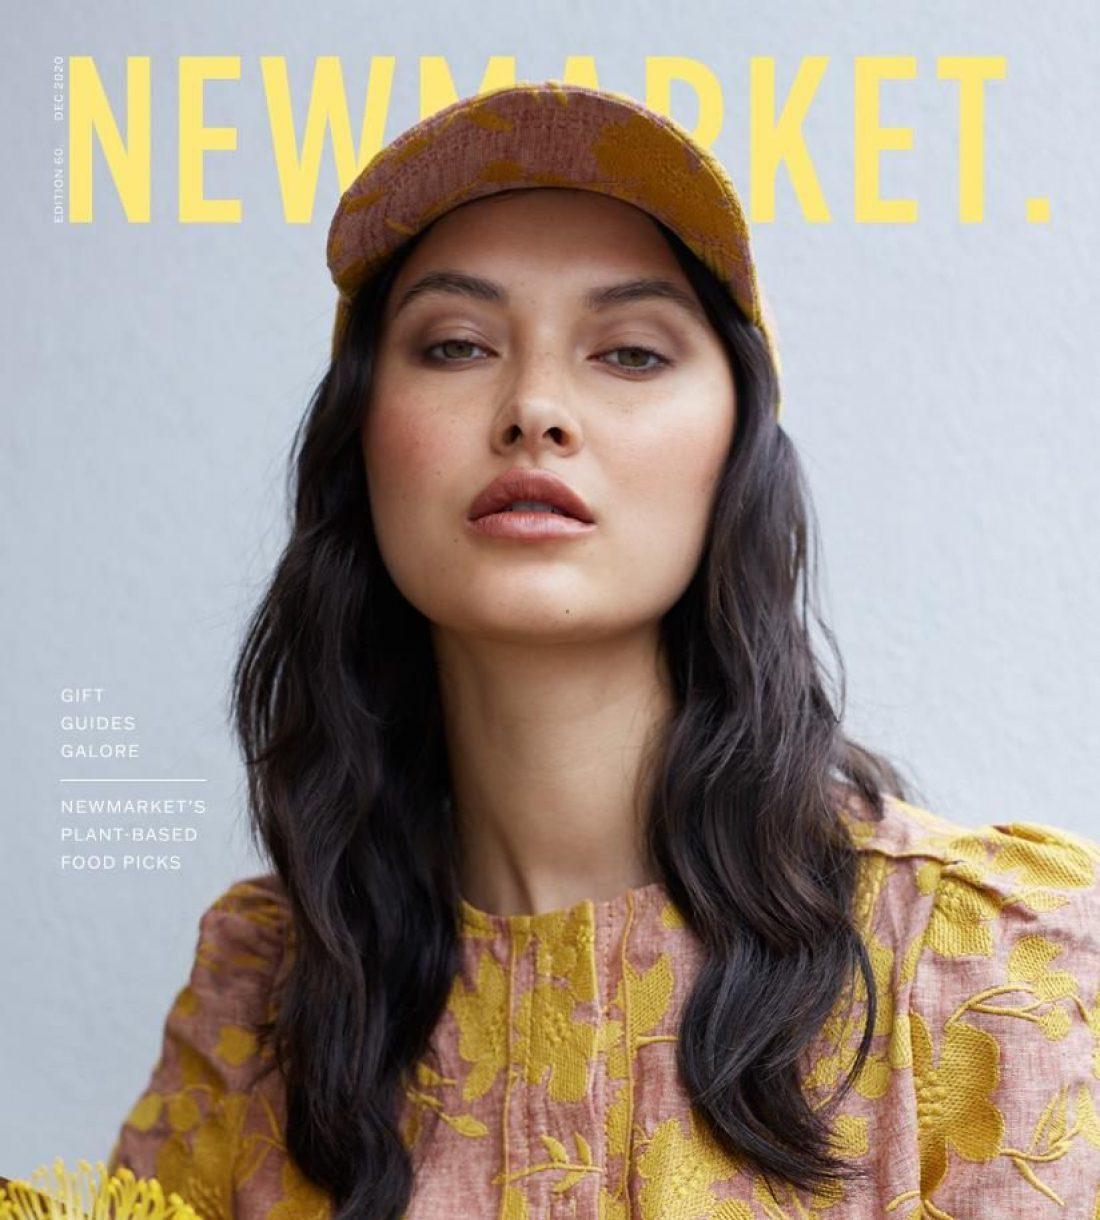 Ella for Newmarket Magazine | Photography: Olivia Kirkpatrick | Styling: Rachel Morton|Makeup: Virginia Carde